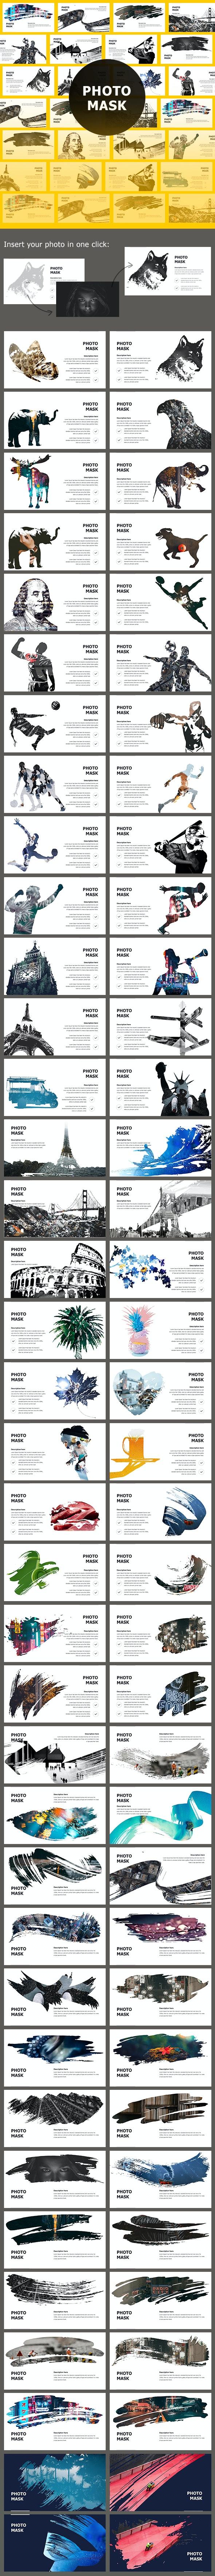 Photo Mask Keynote Themes - Creative Keynote Templates